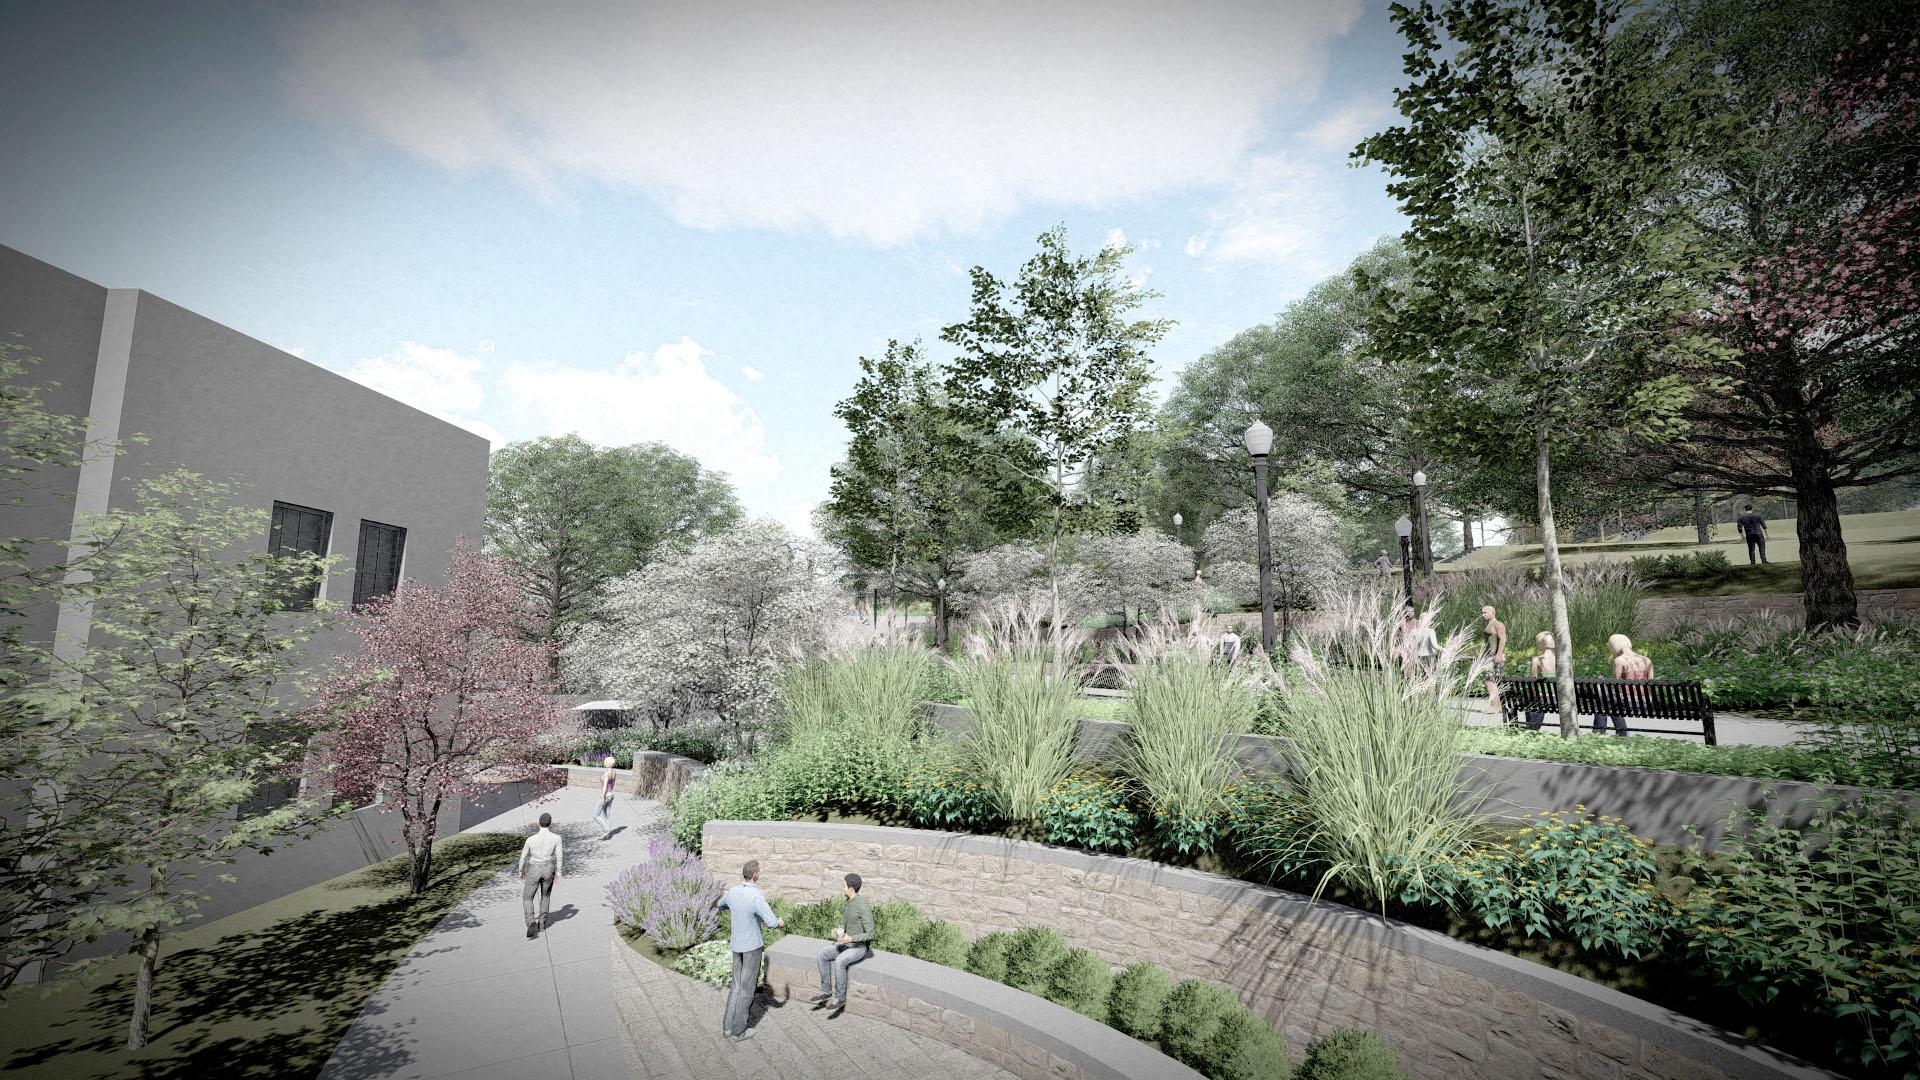 wku-hilltop-master-plan-passthrough-landscape-architecture